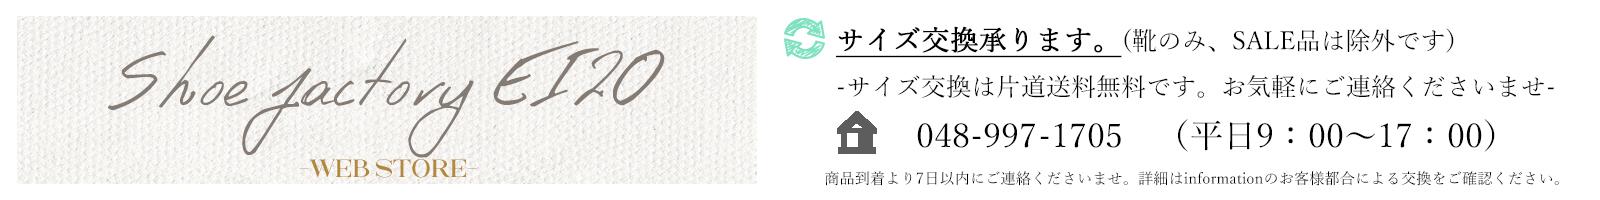 shoe factory EIZO 靴のエイゾー:EIZO 創業60年の革靴工場エイゾー直営のオンラインストア